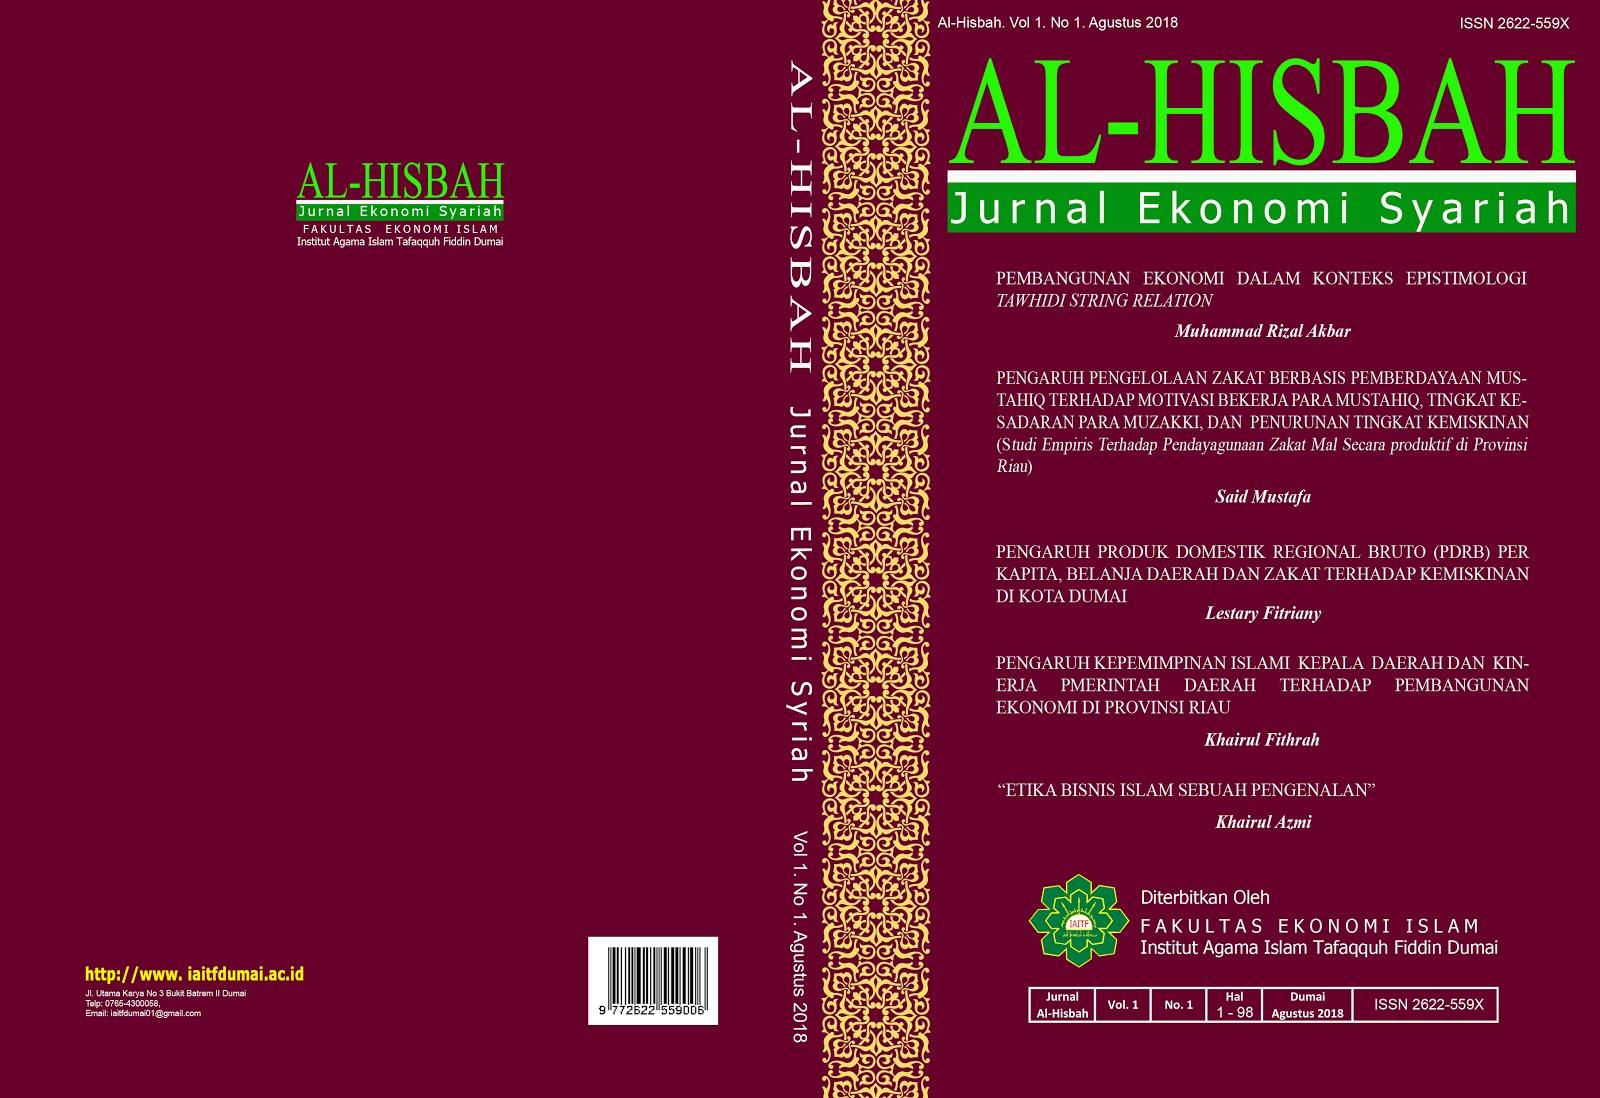 Jurnal Al-Hisbah